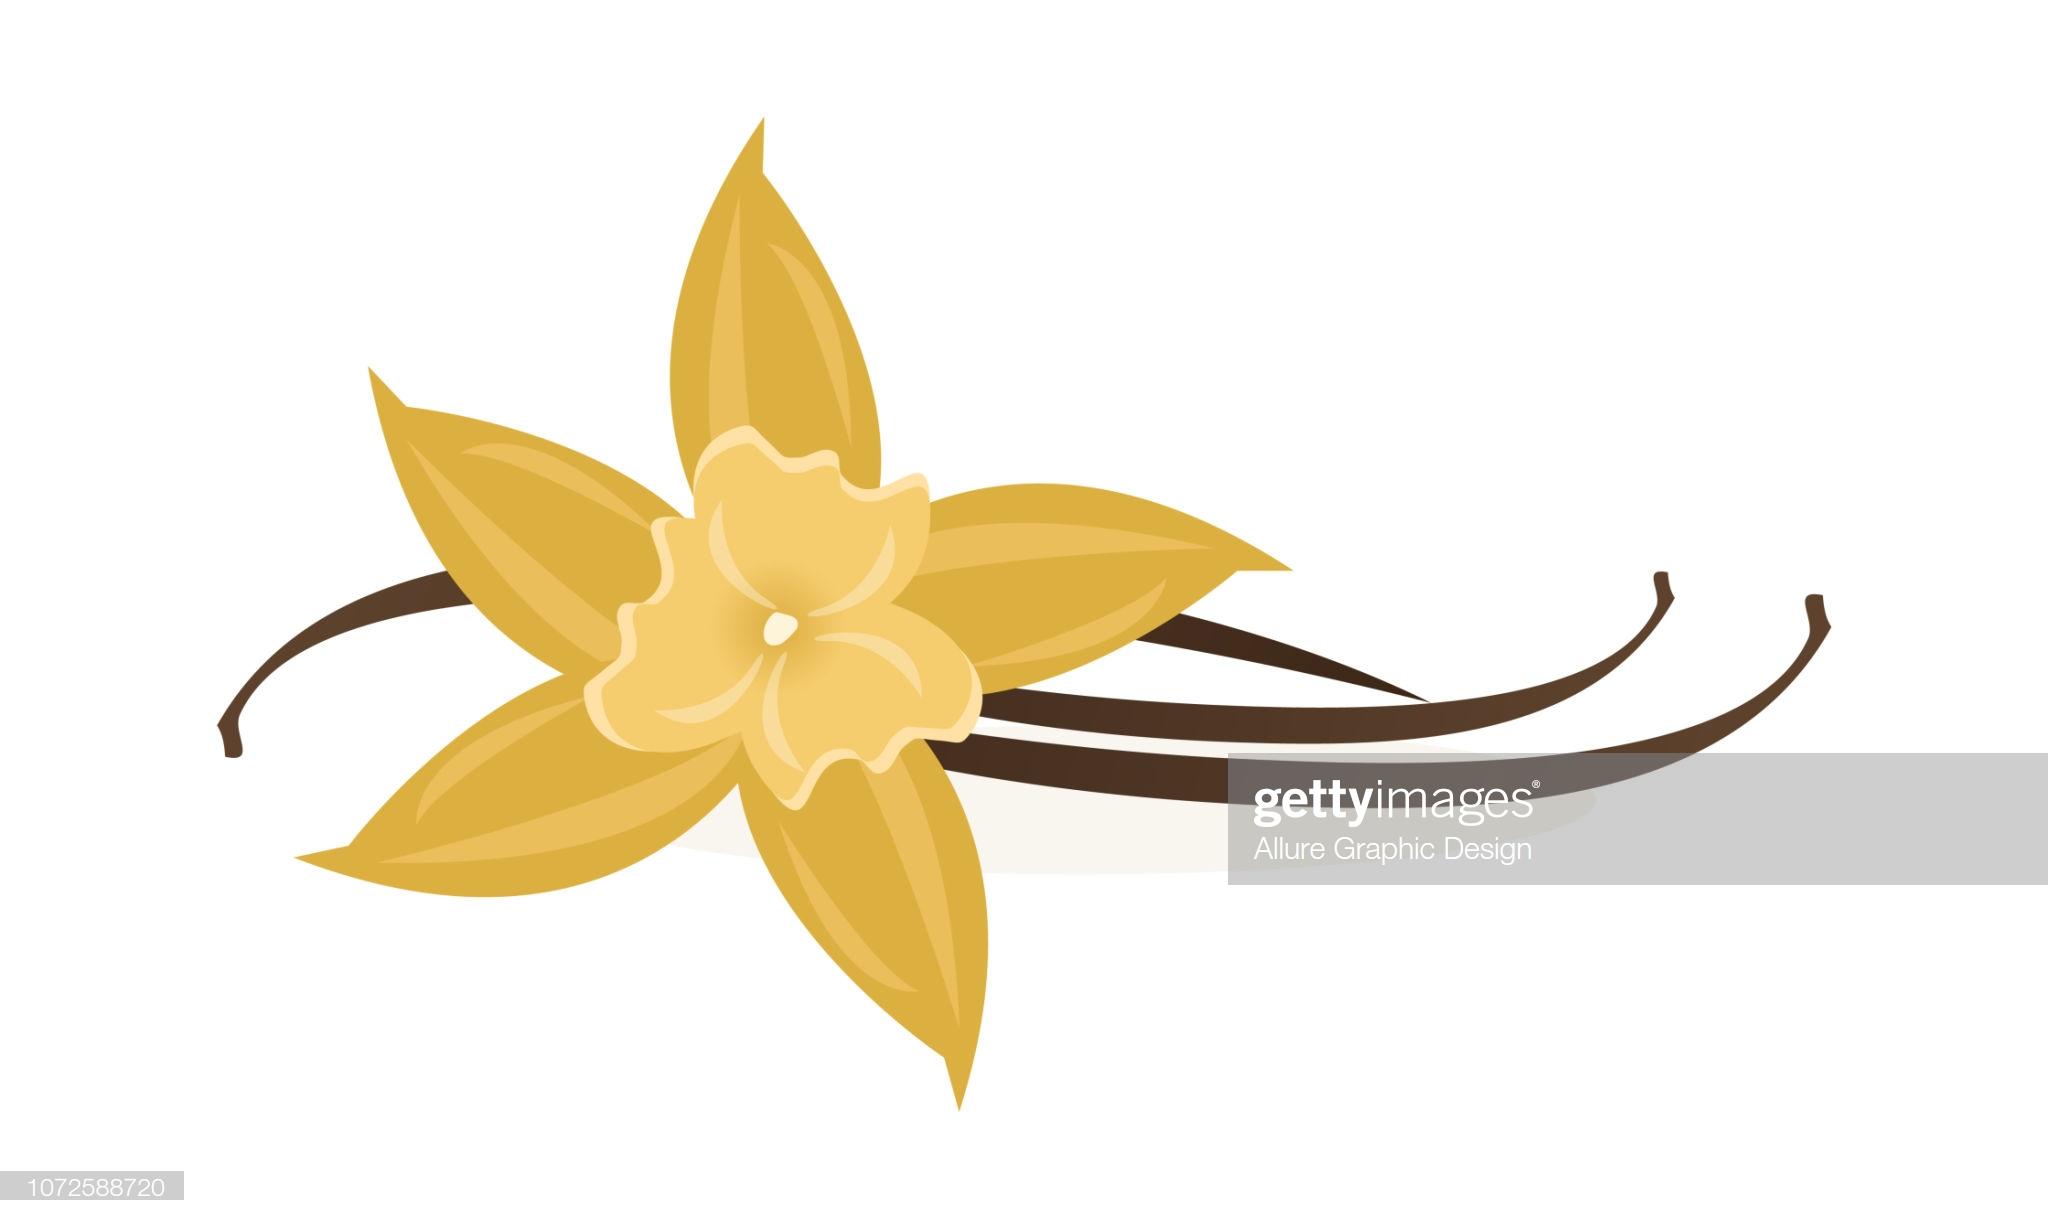 Vanilla Flower Leaves With Pod Stems In 2021 Flower Illustration Flowers Free Illustrations